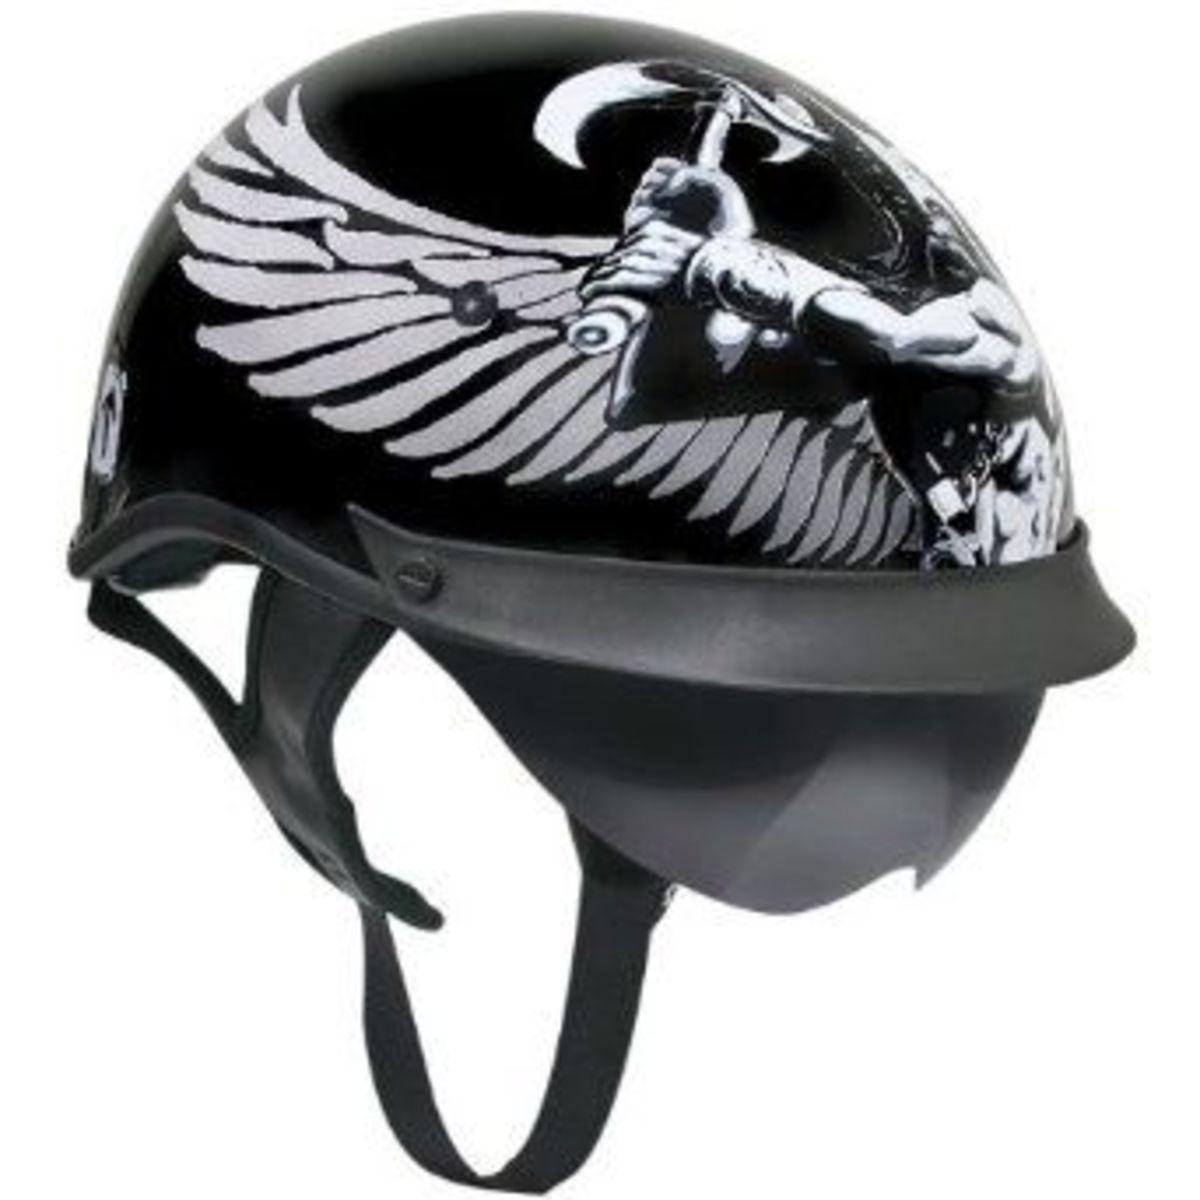 outlaw chopper half helmet